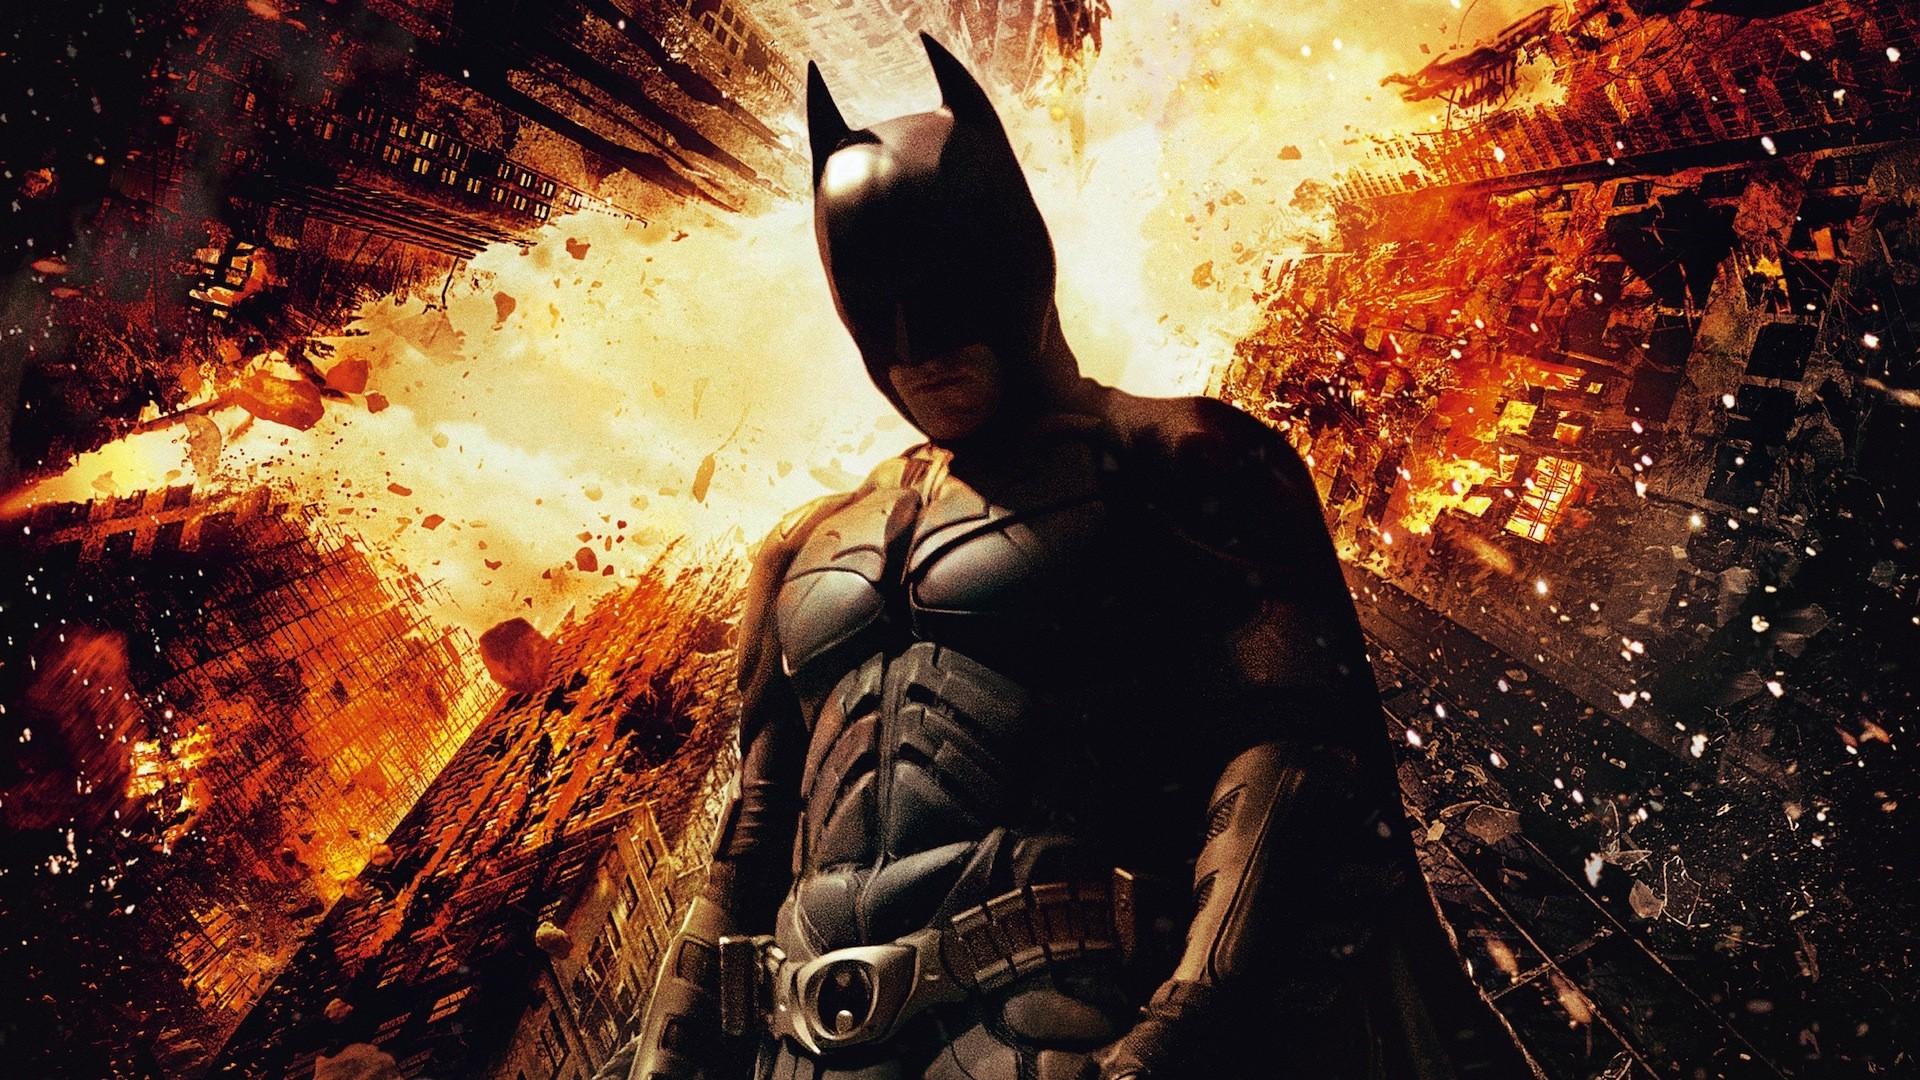 Dark Knight best Wallpaper